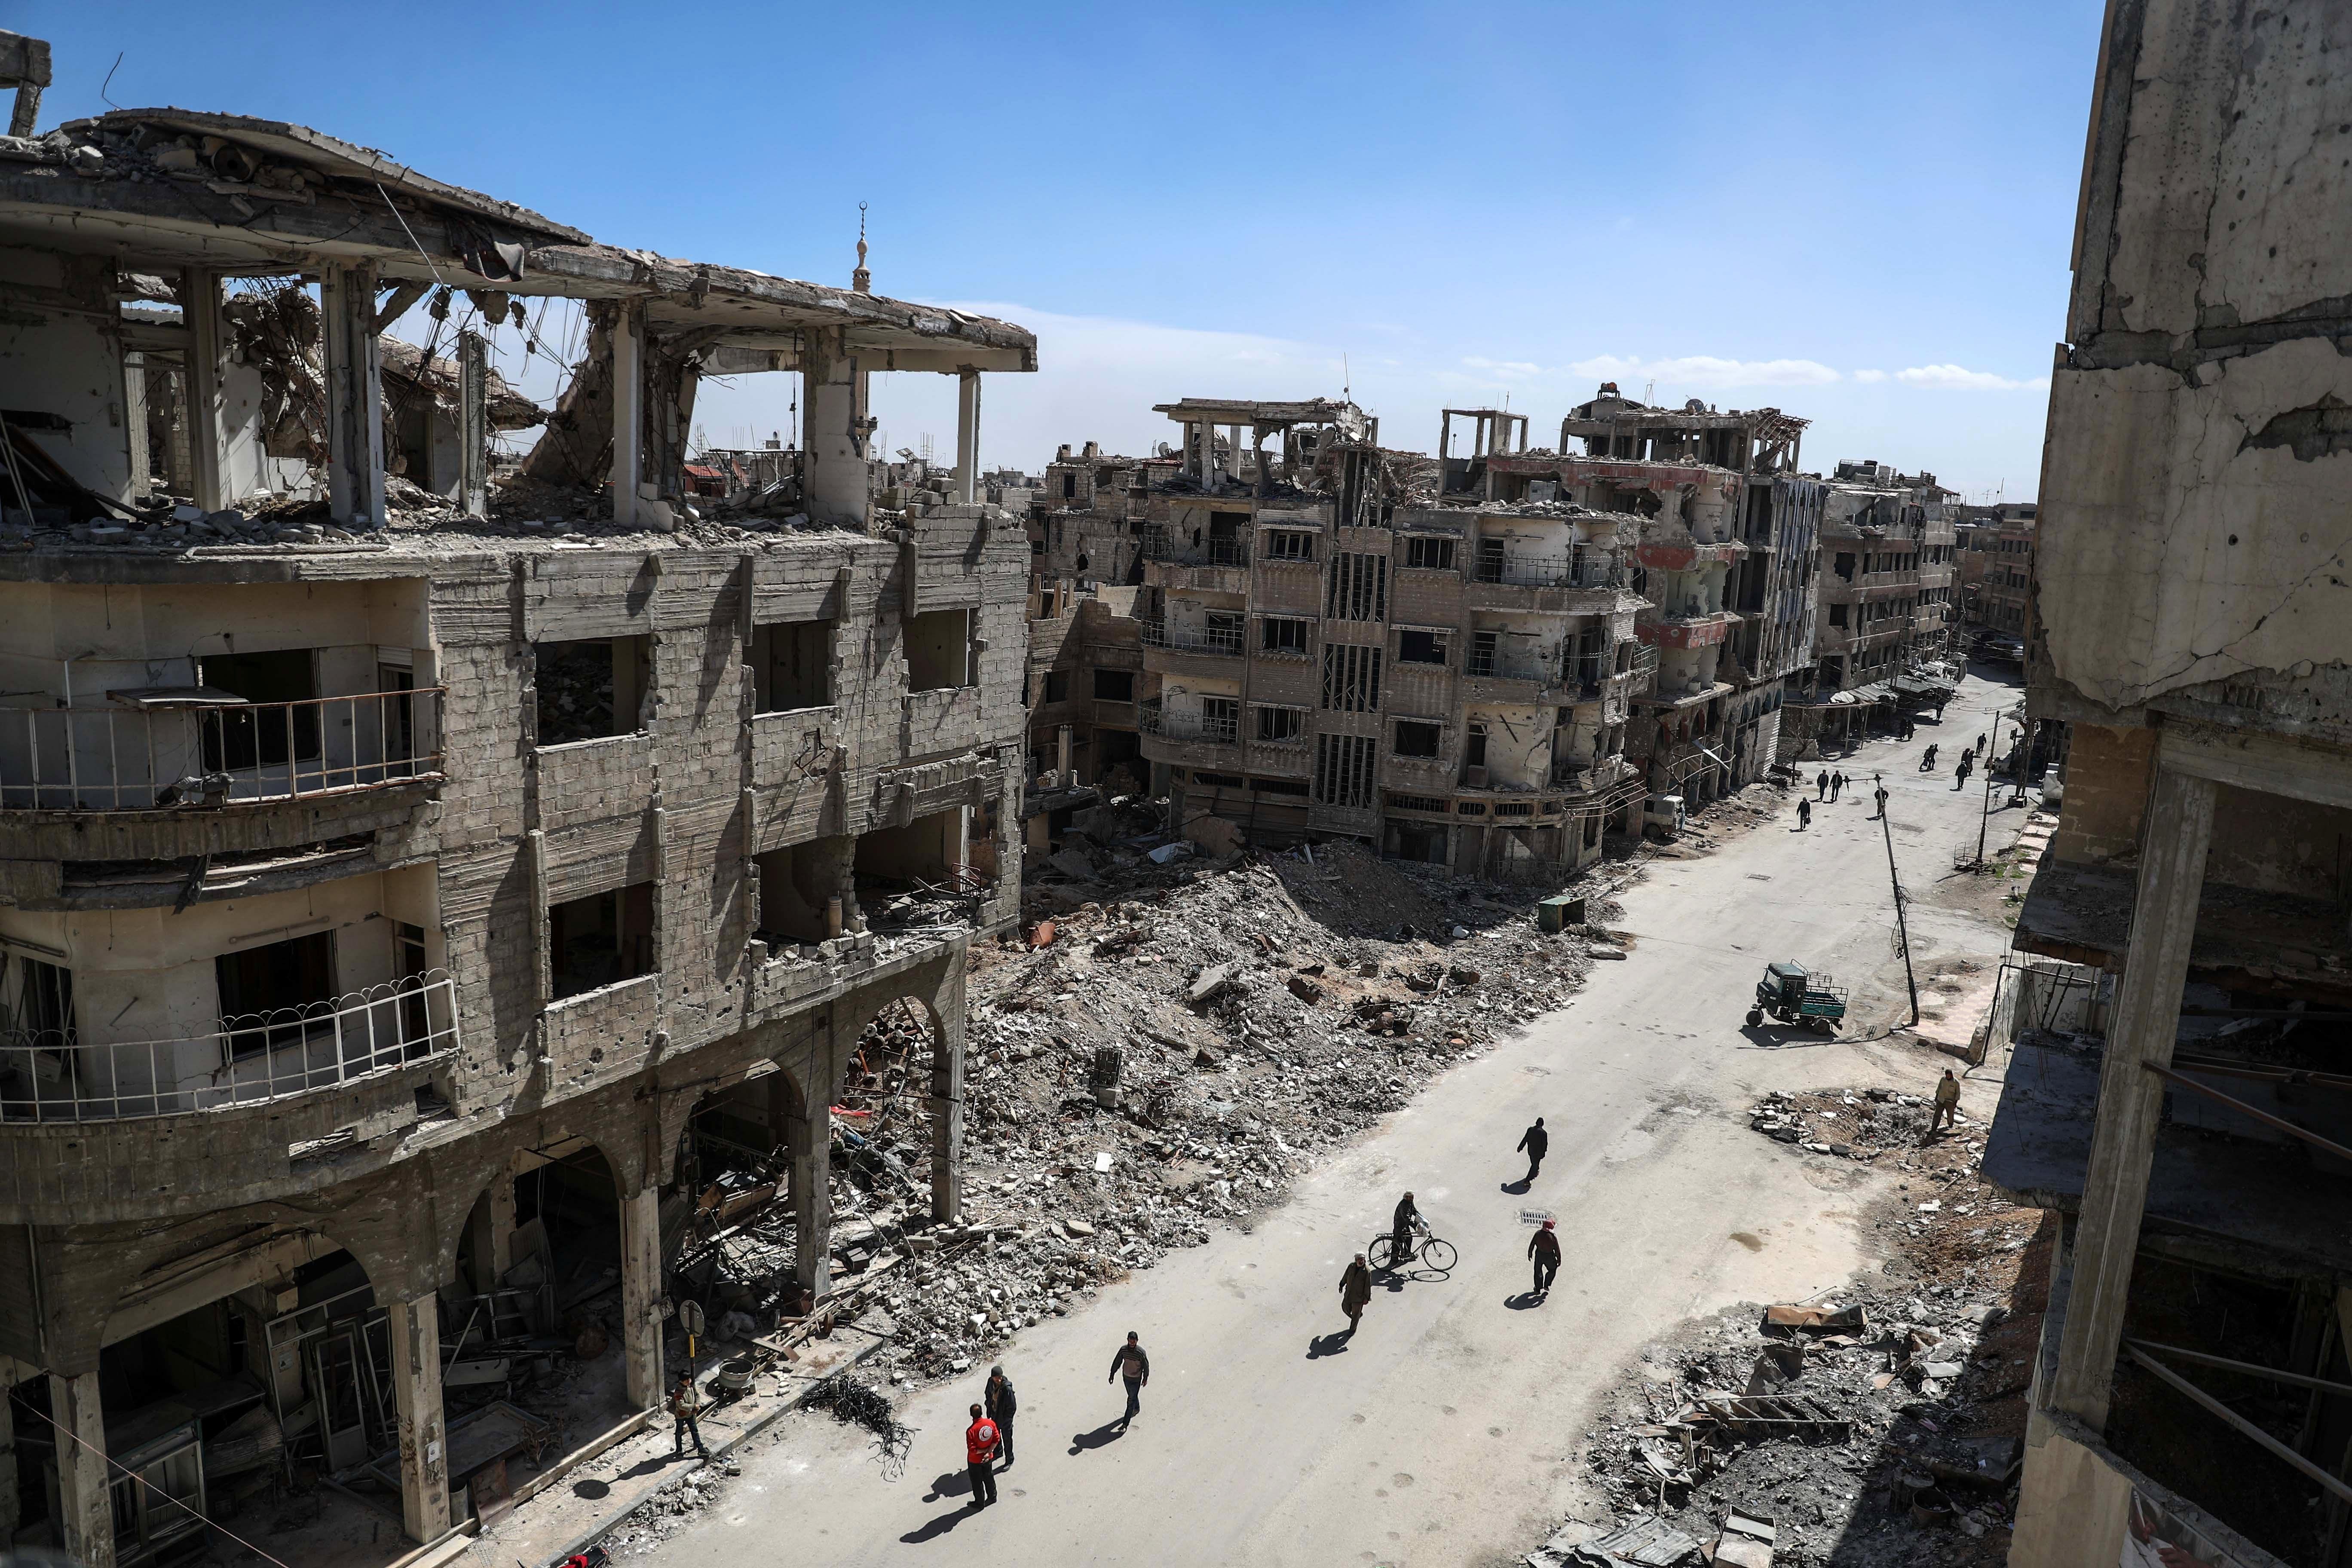 Rusia recibe un nuevo revés sobre Siria